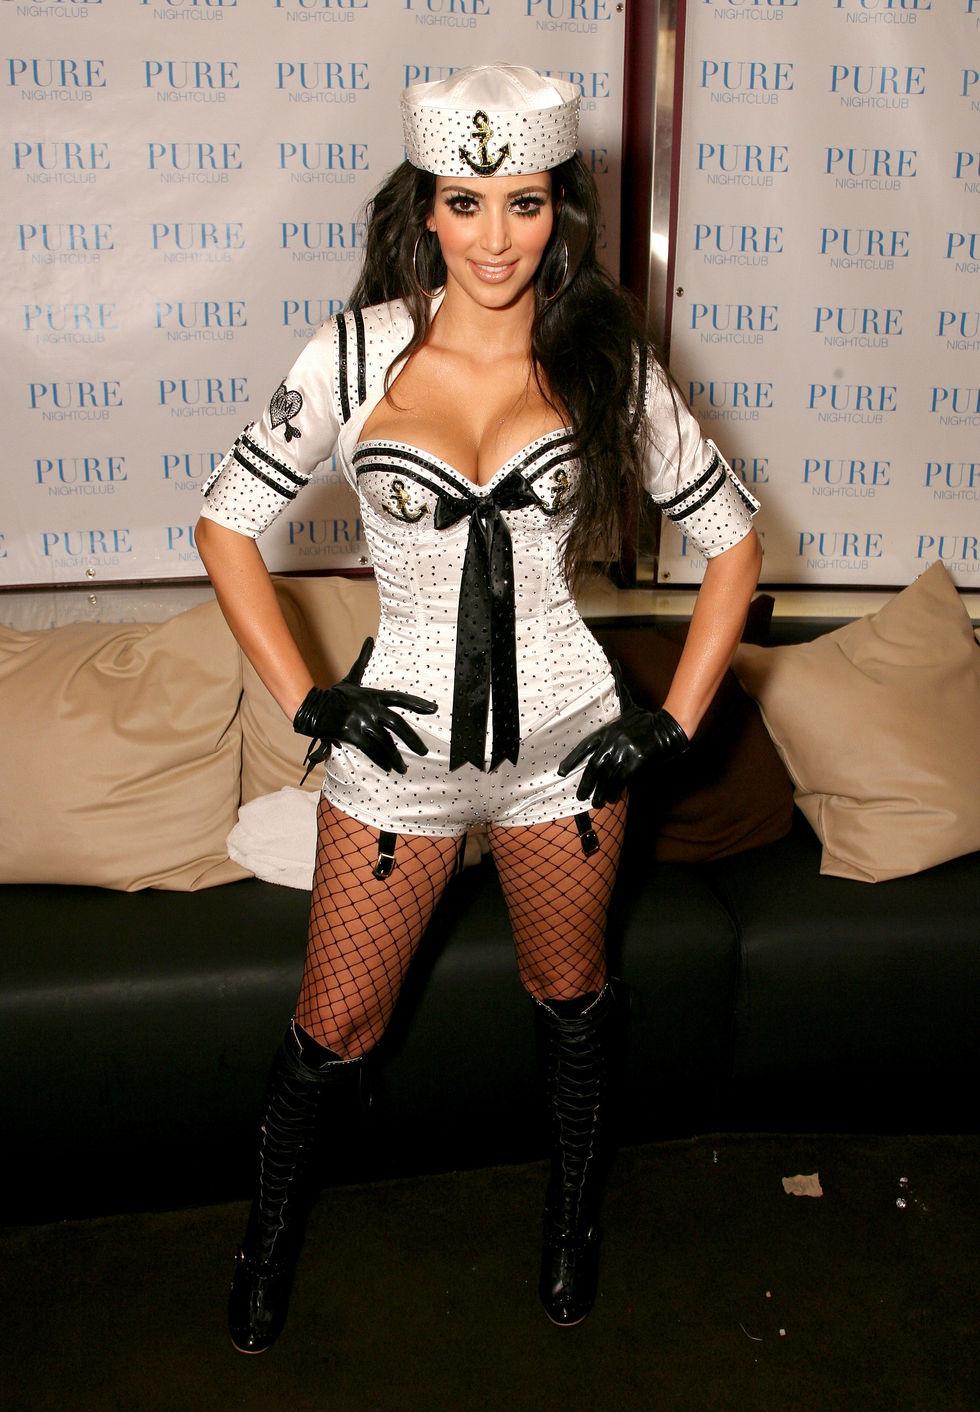 kim-kardashian-performs-with-pussycat-dolls-at-pure-nightclub-in-las-vegas-01